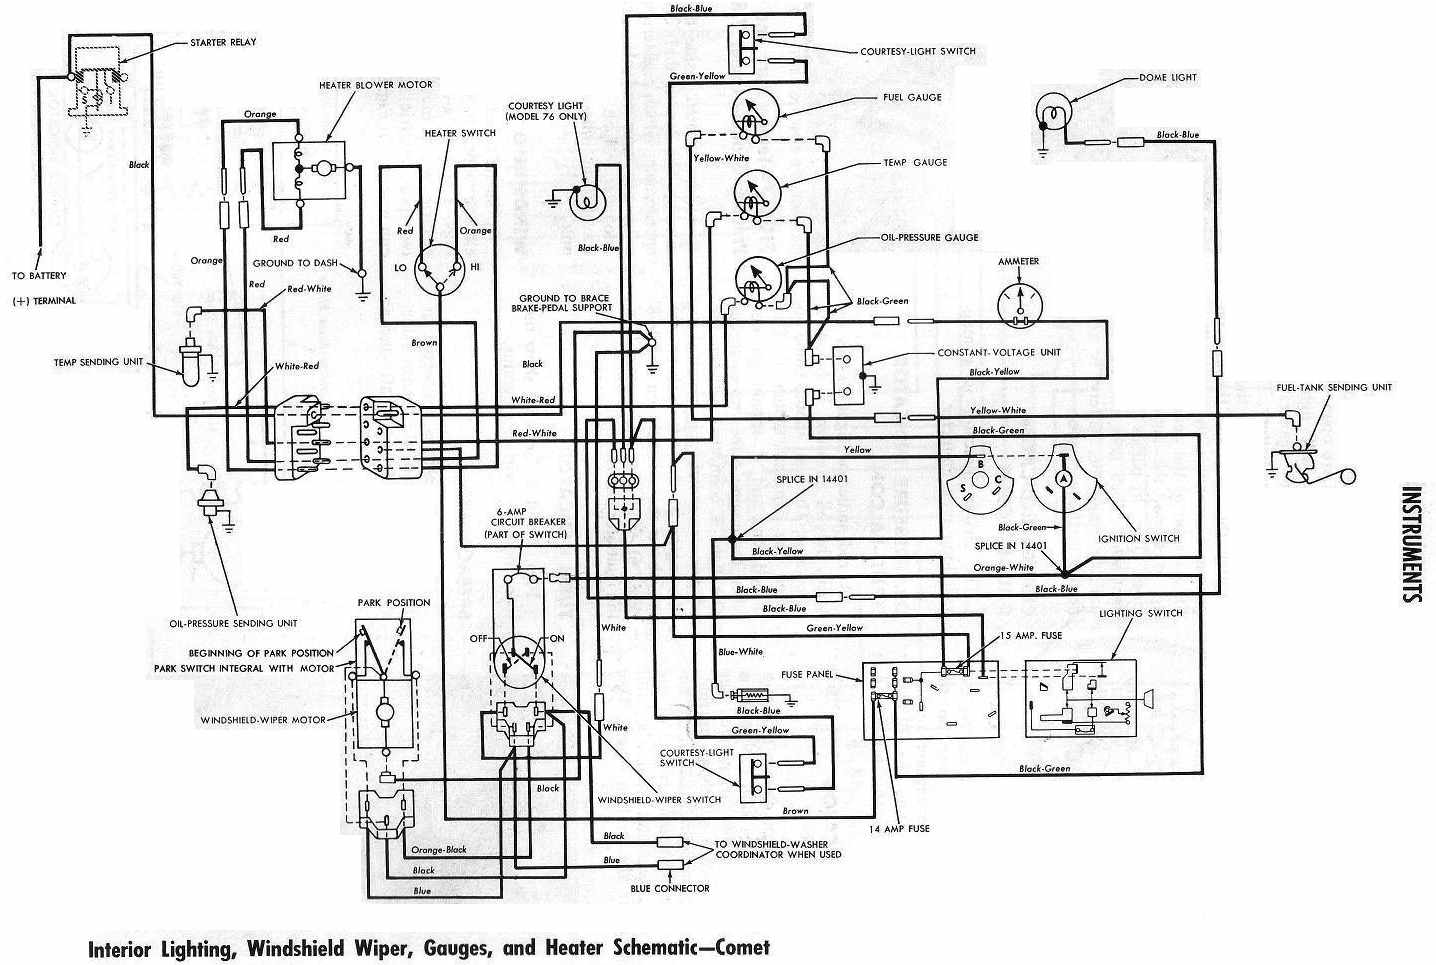 medium resolution of 1964 comet fuse box wiring diagram co11964 comet fuse box 4 drm naturheilpraxis deistler plaug de